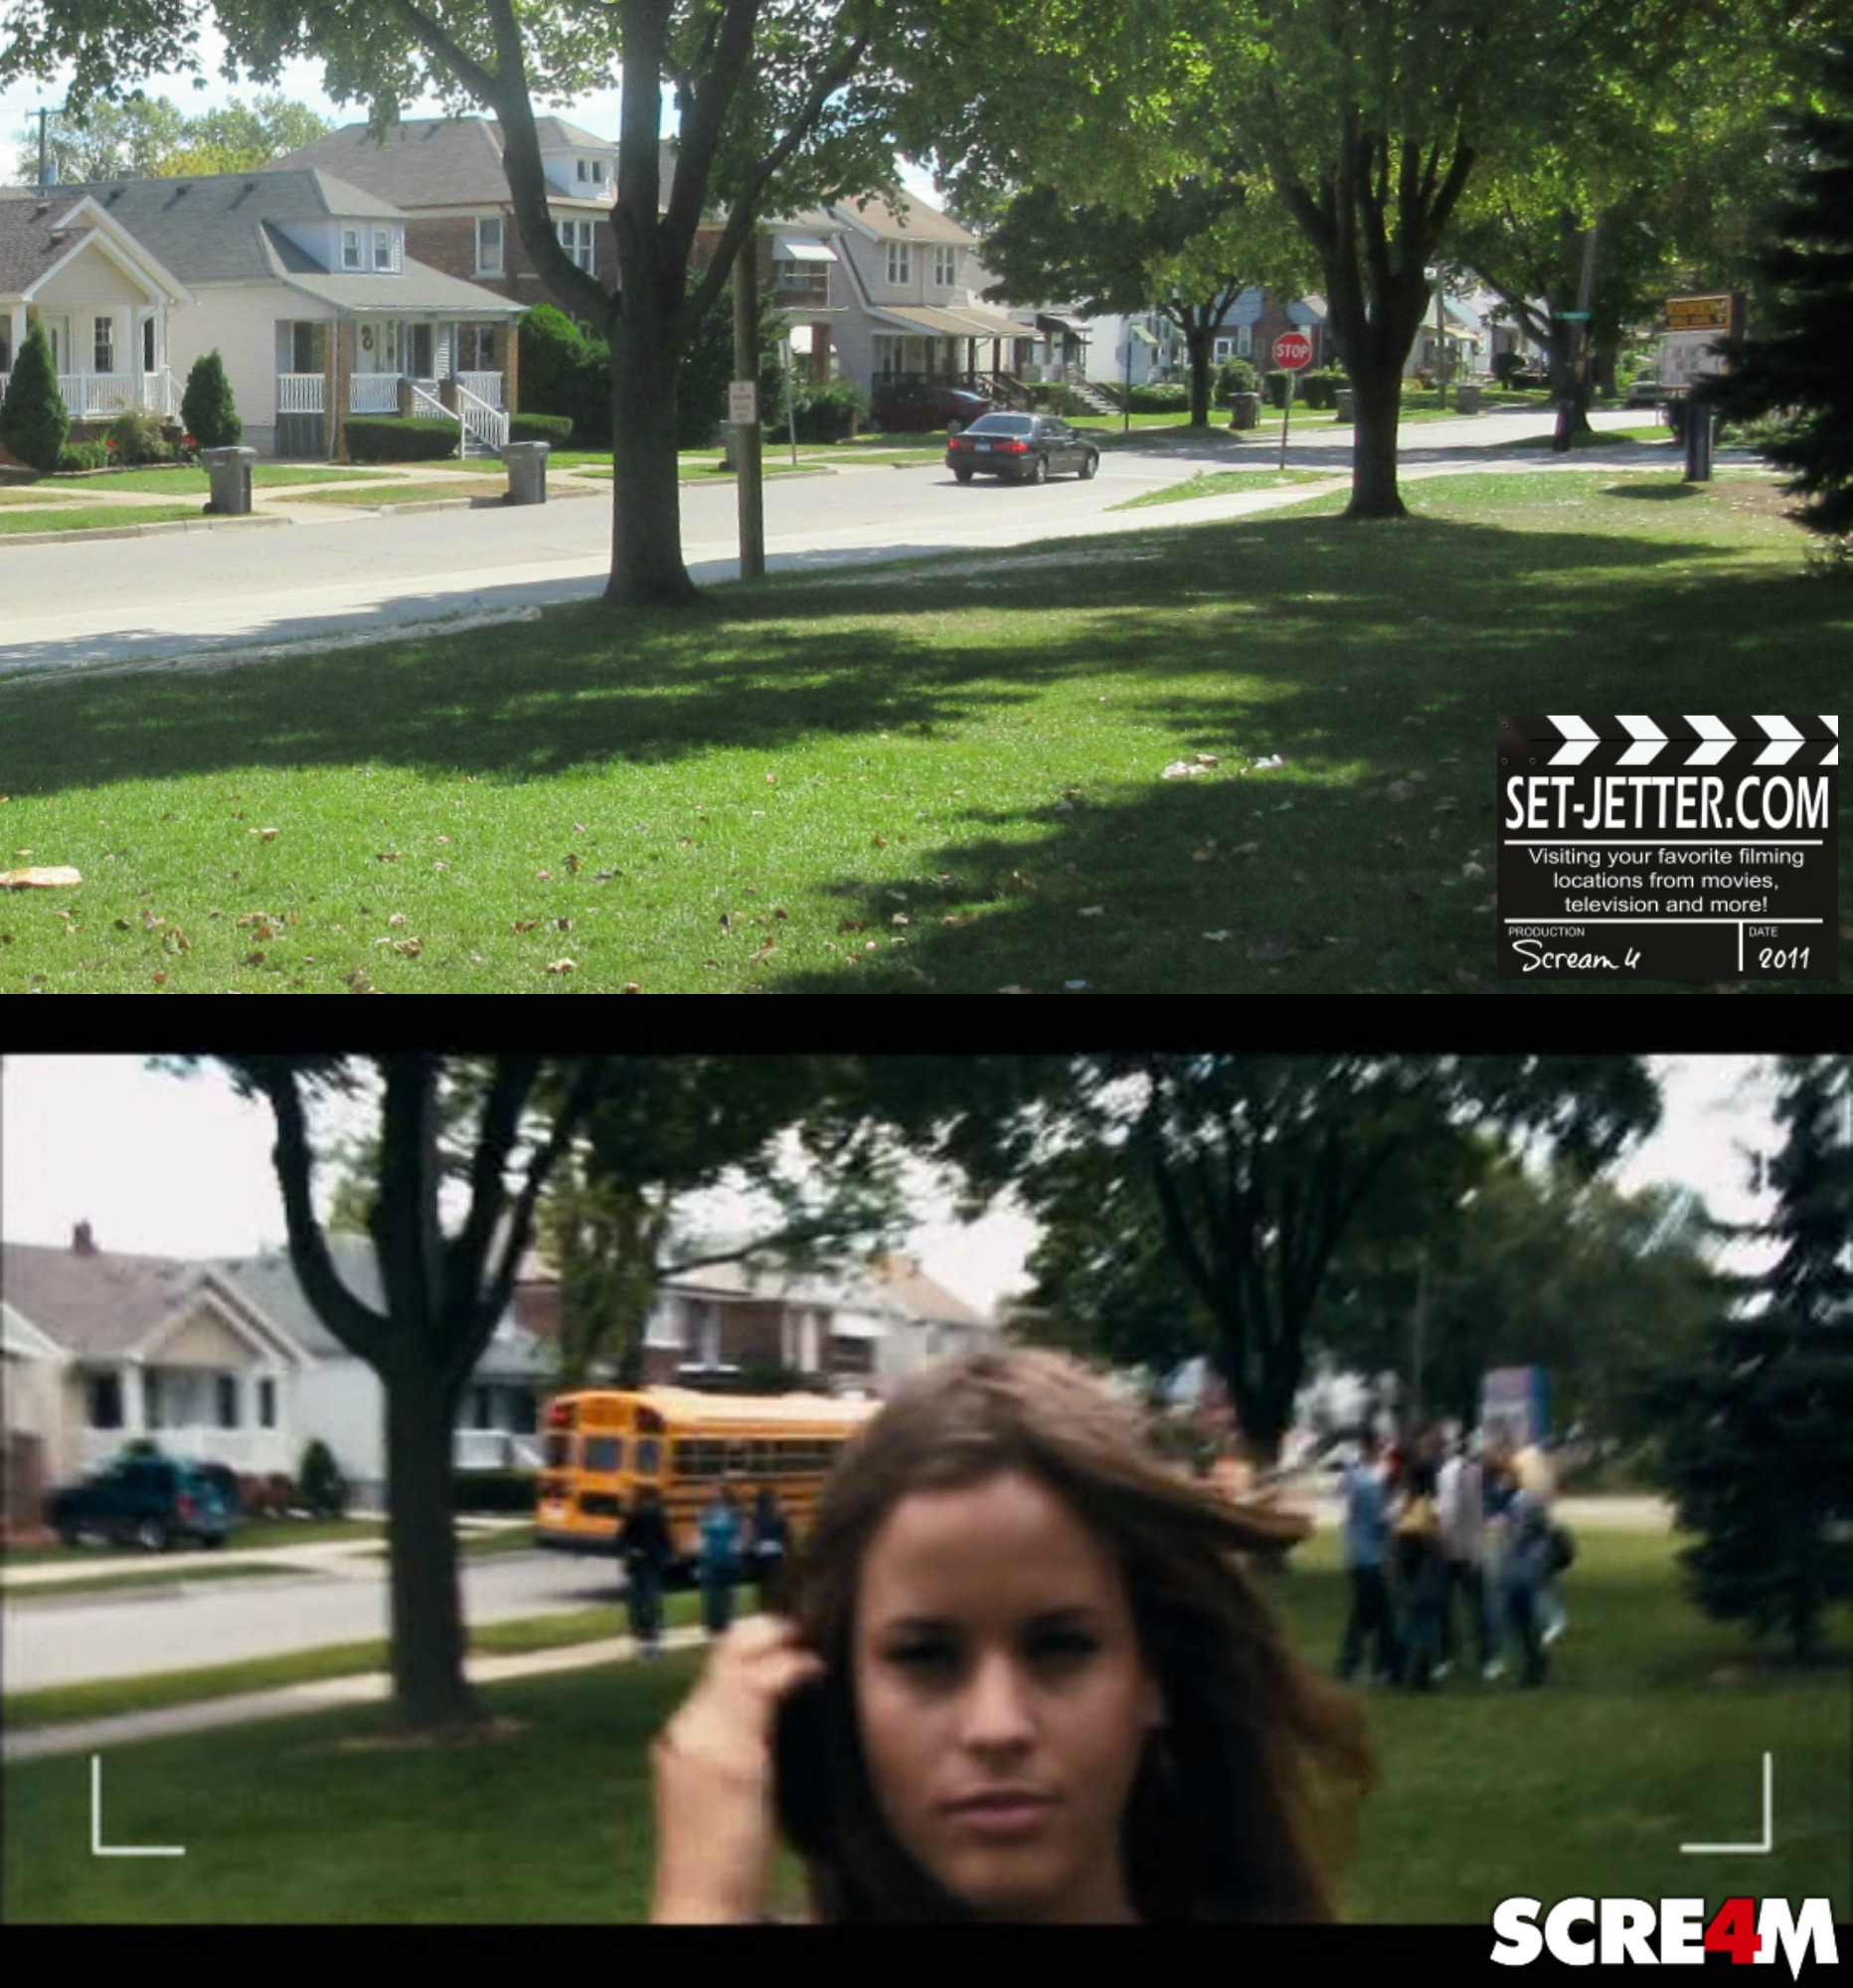 Scream4 comparison 62.jpg